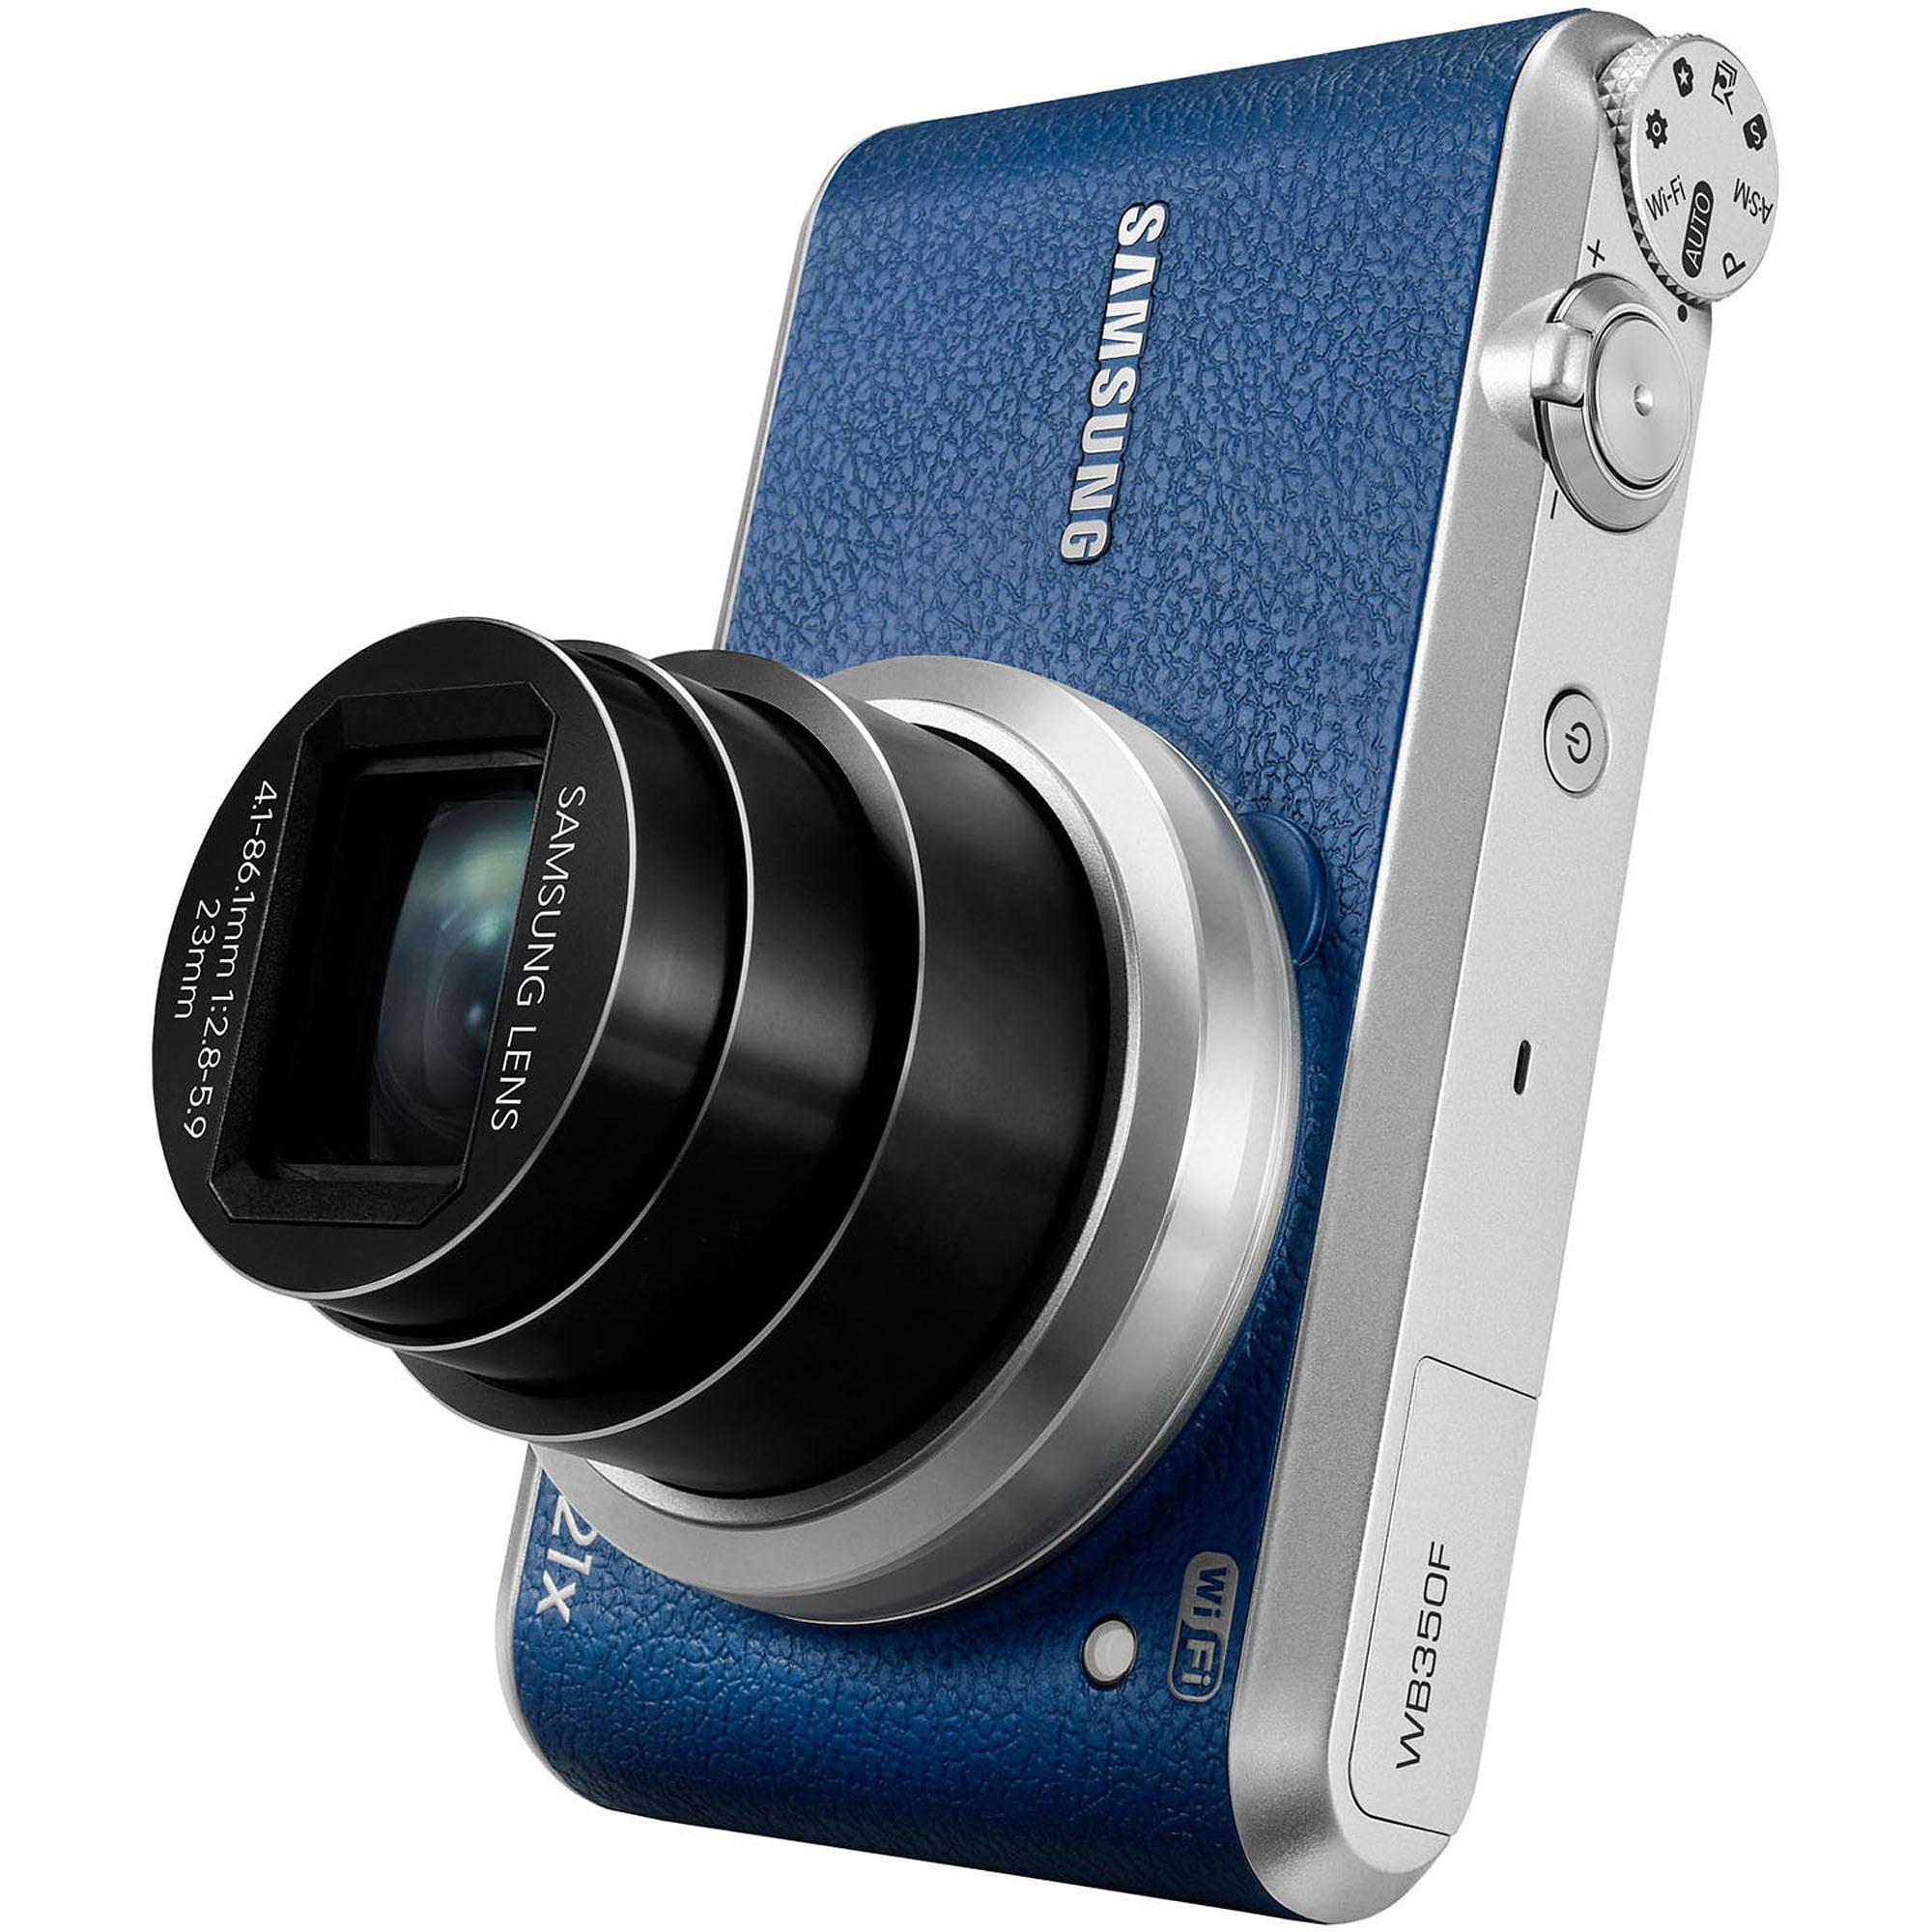 Samsung Blue WB350F Digital Camera with 16.3 Megapixels a...